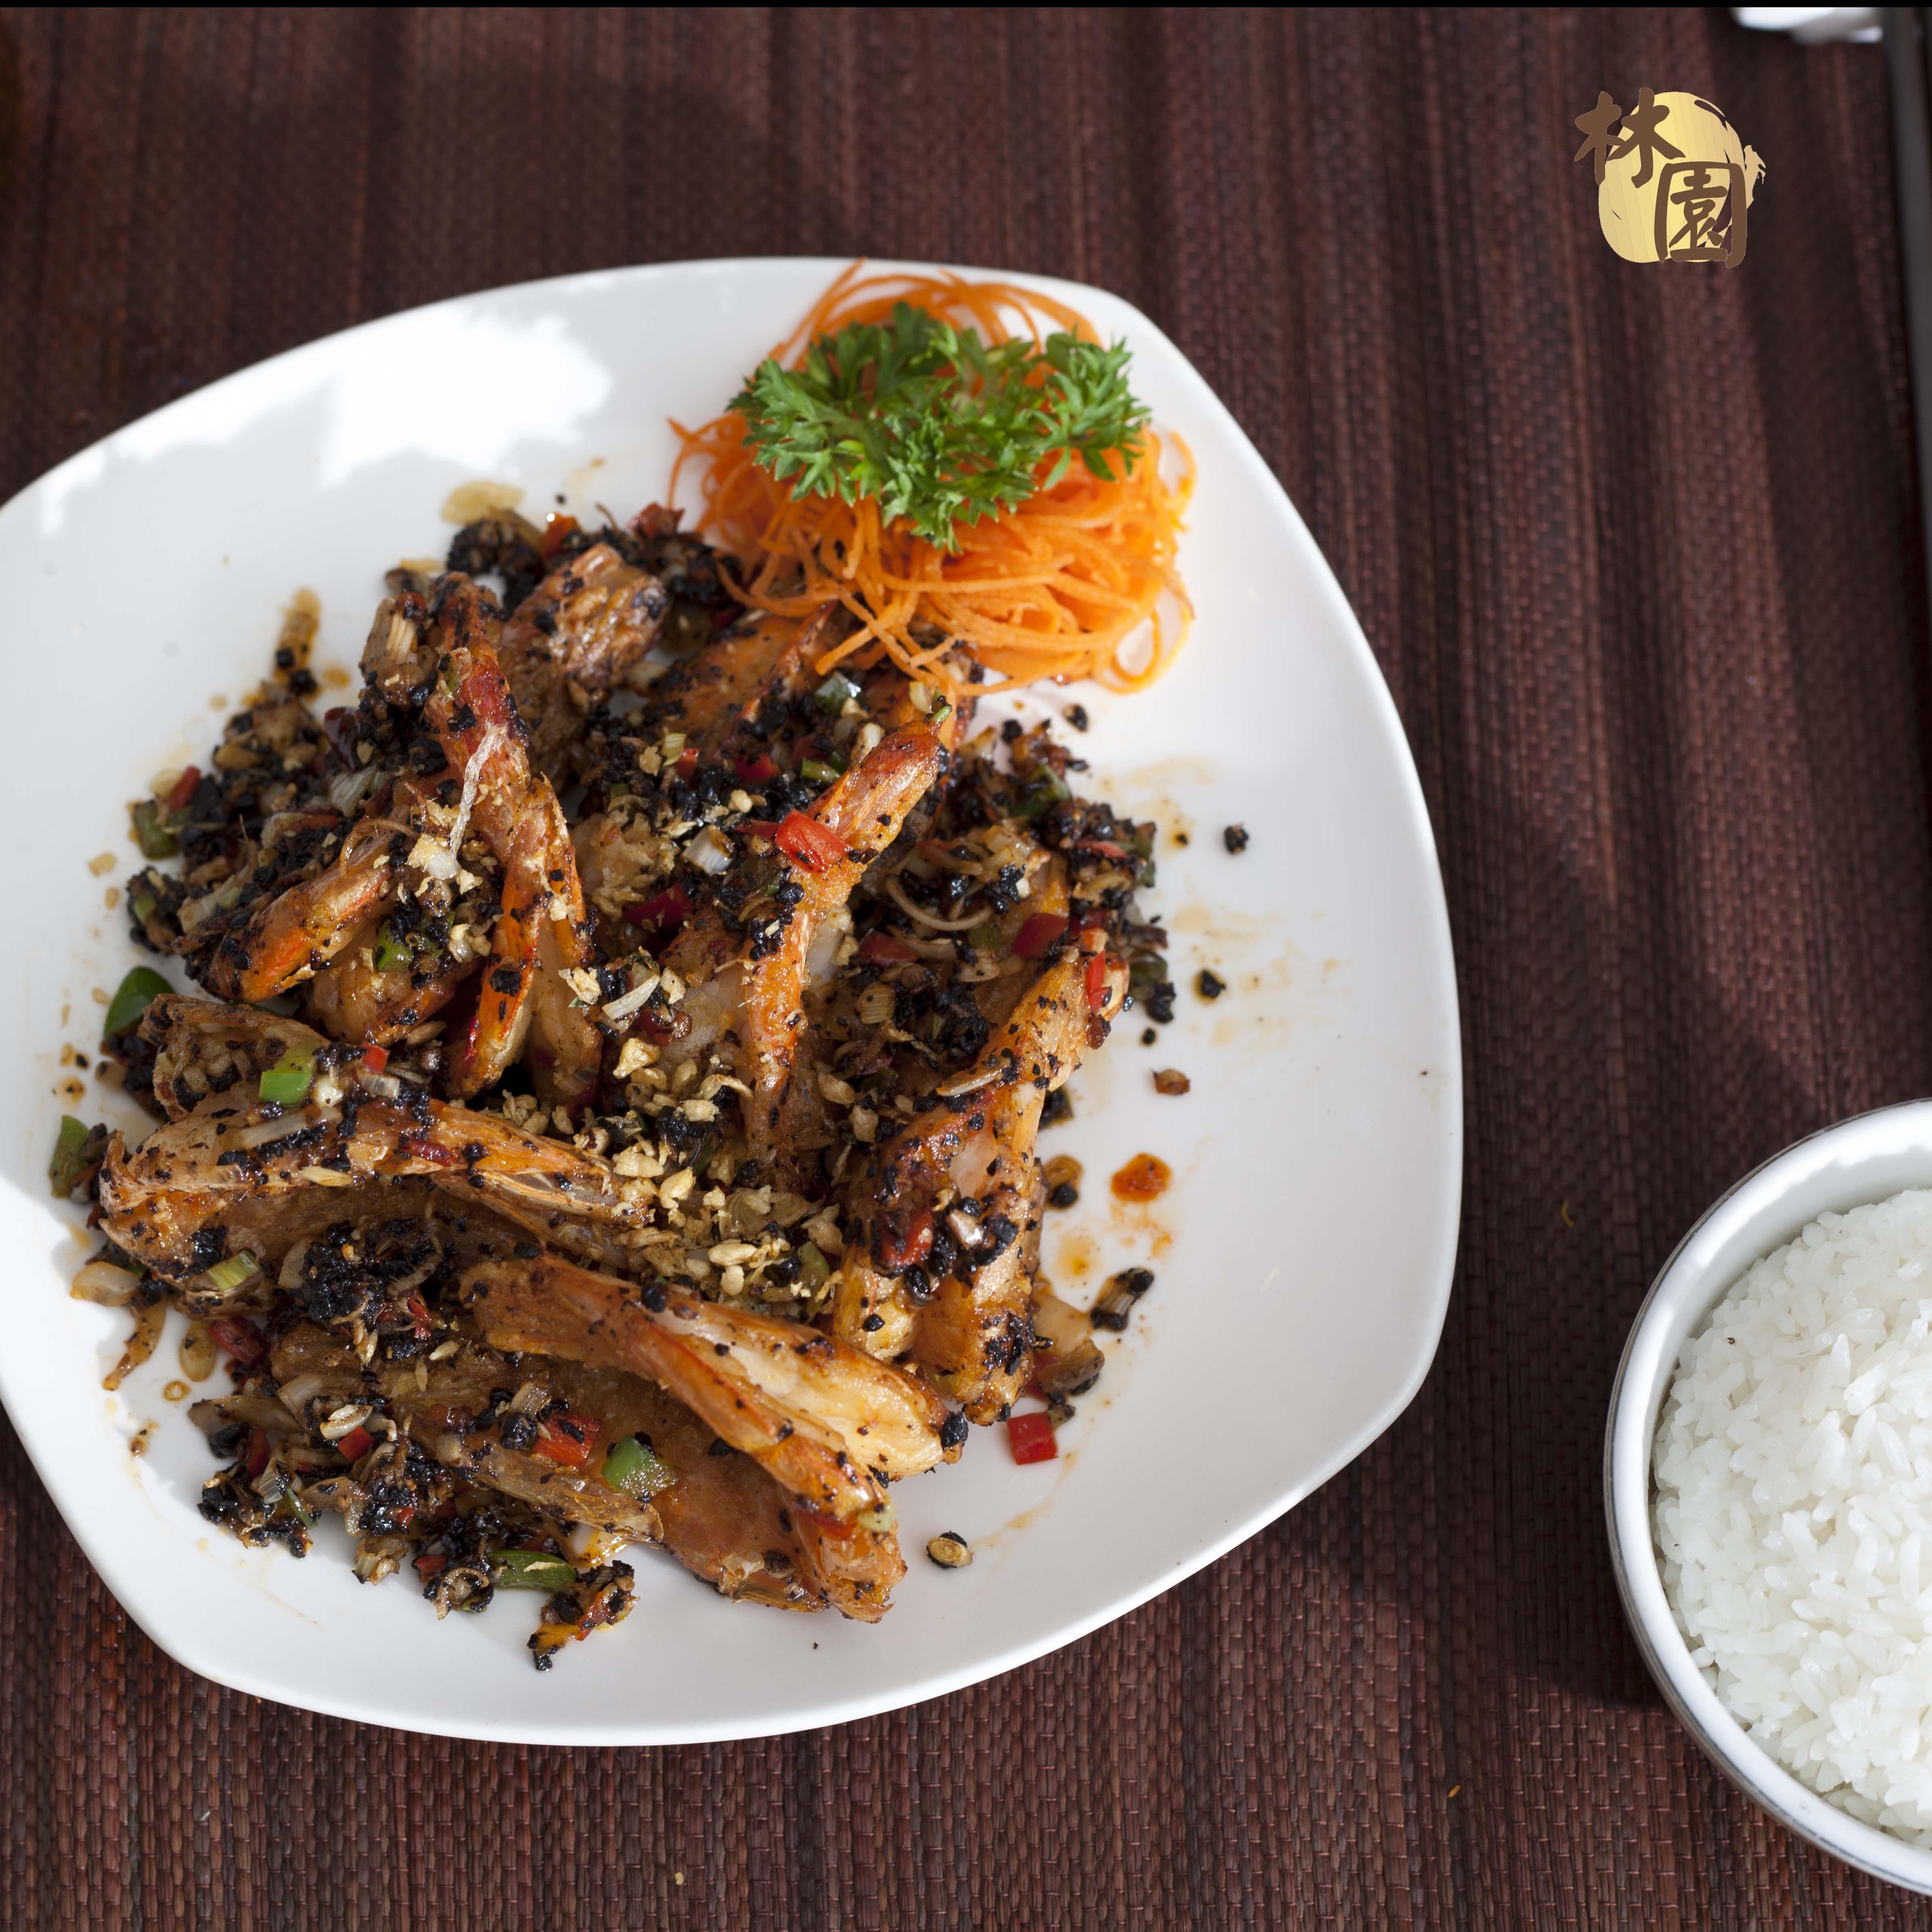 Shrimp in Bi Feng Tang style